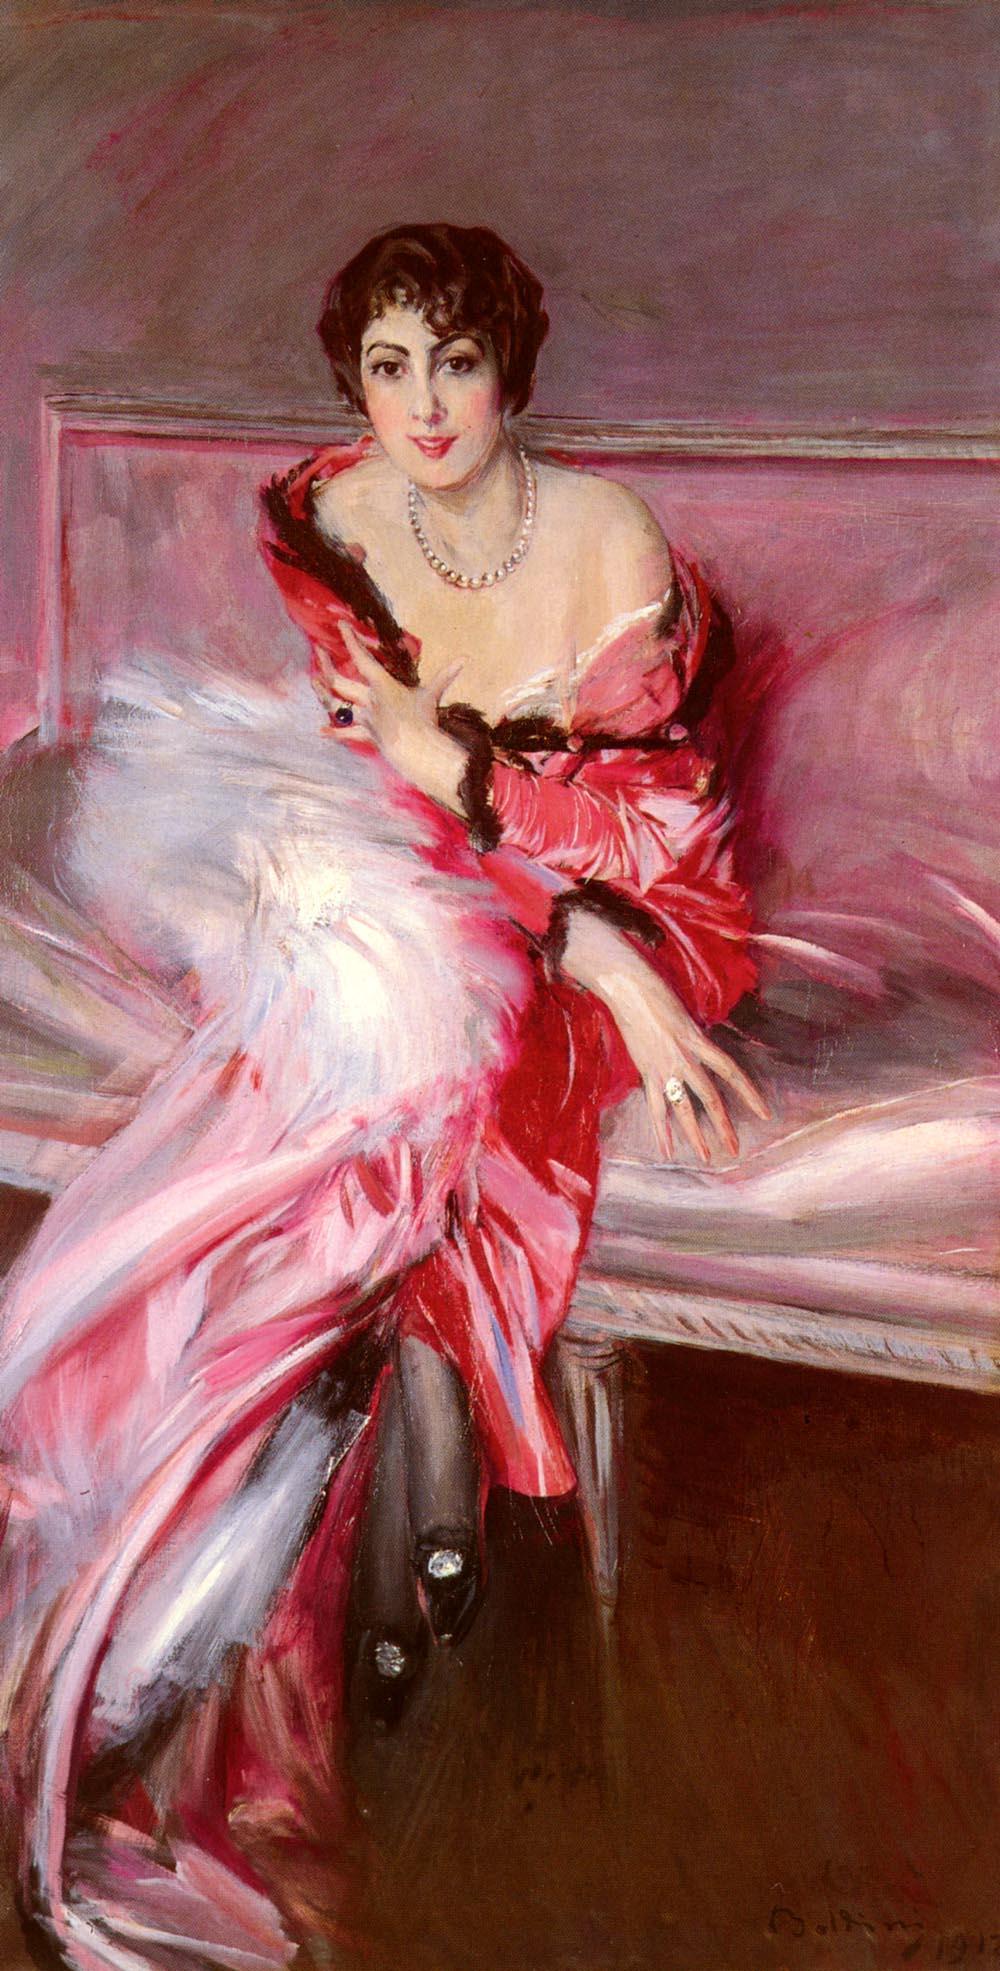 http://upload.wikimedia.org/wikipedia/commons/2/20/Boldini_-_Madame_Juillard_In_Red.jpg